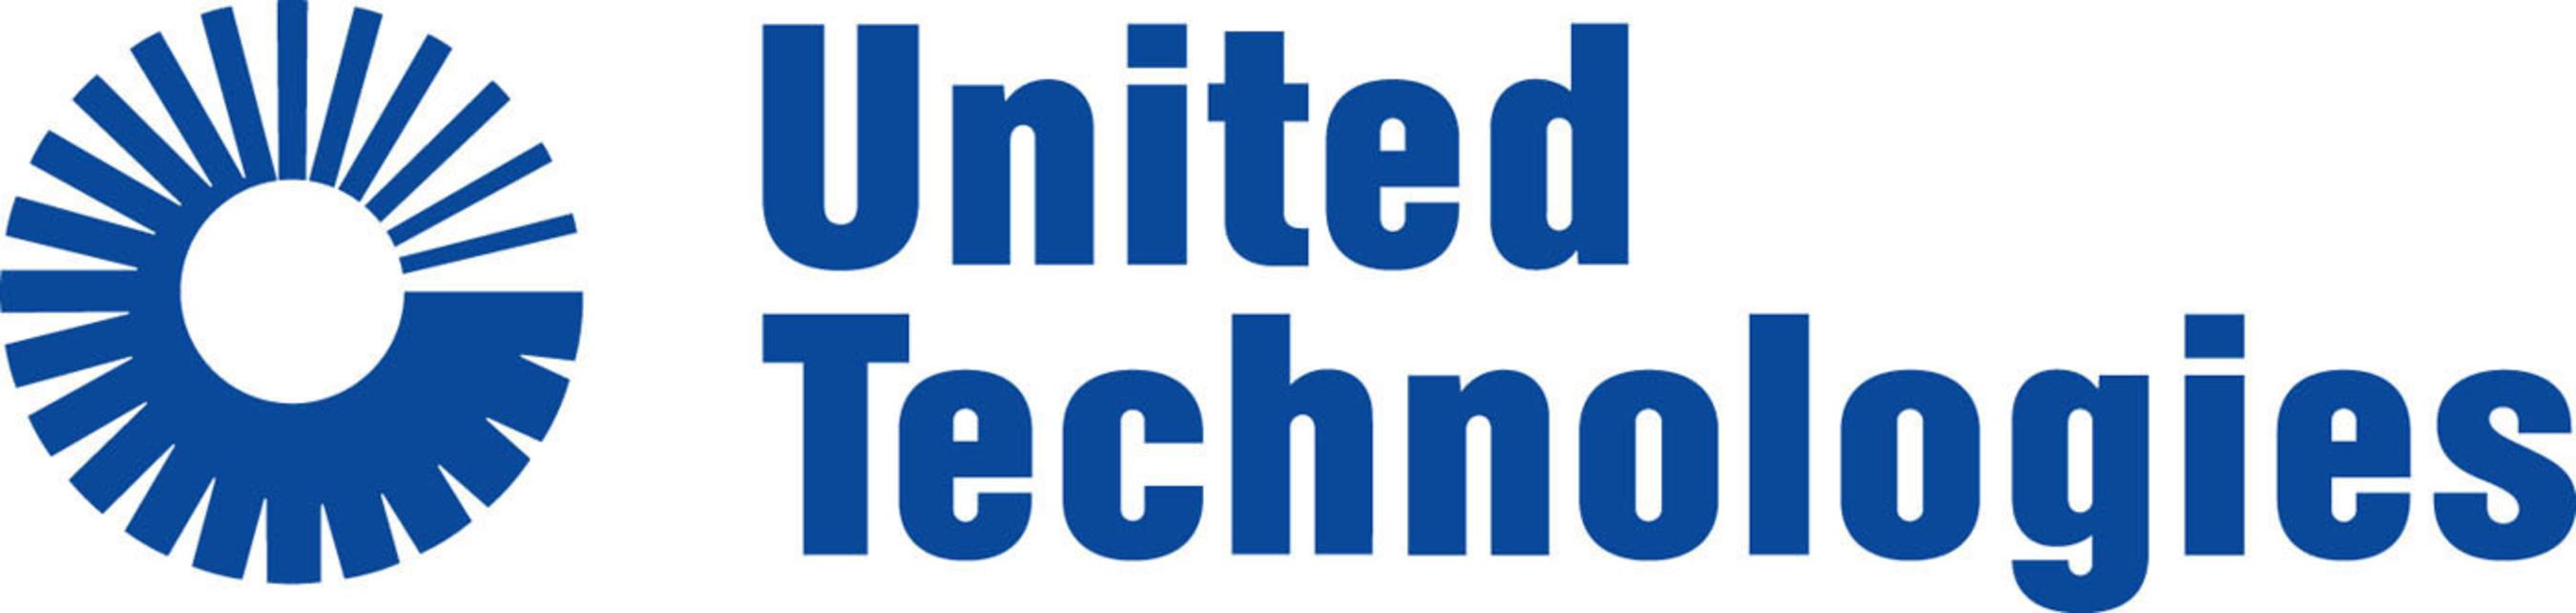 United Technologies Corp. (PRNewsFoto/United Technologies Corp.)